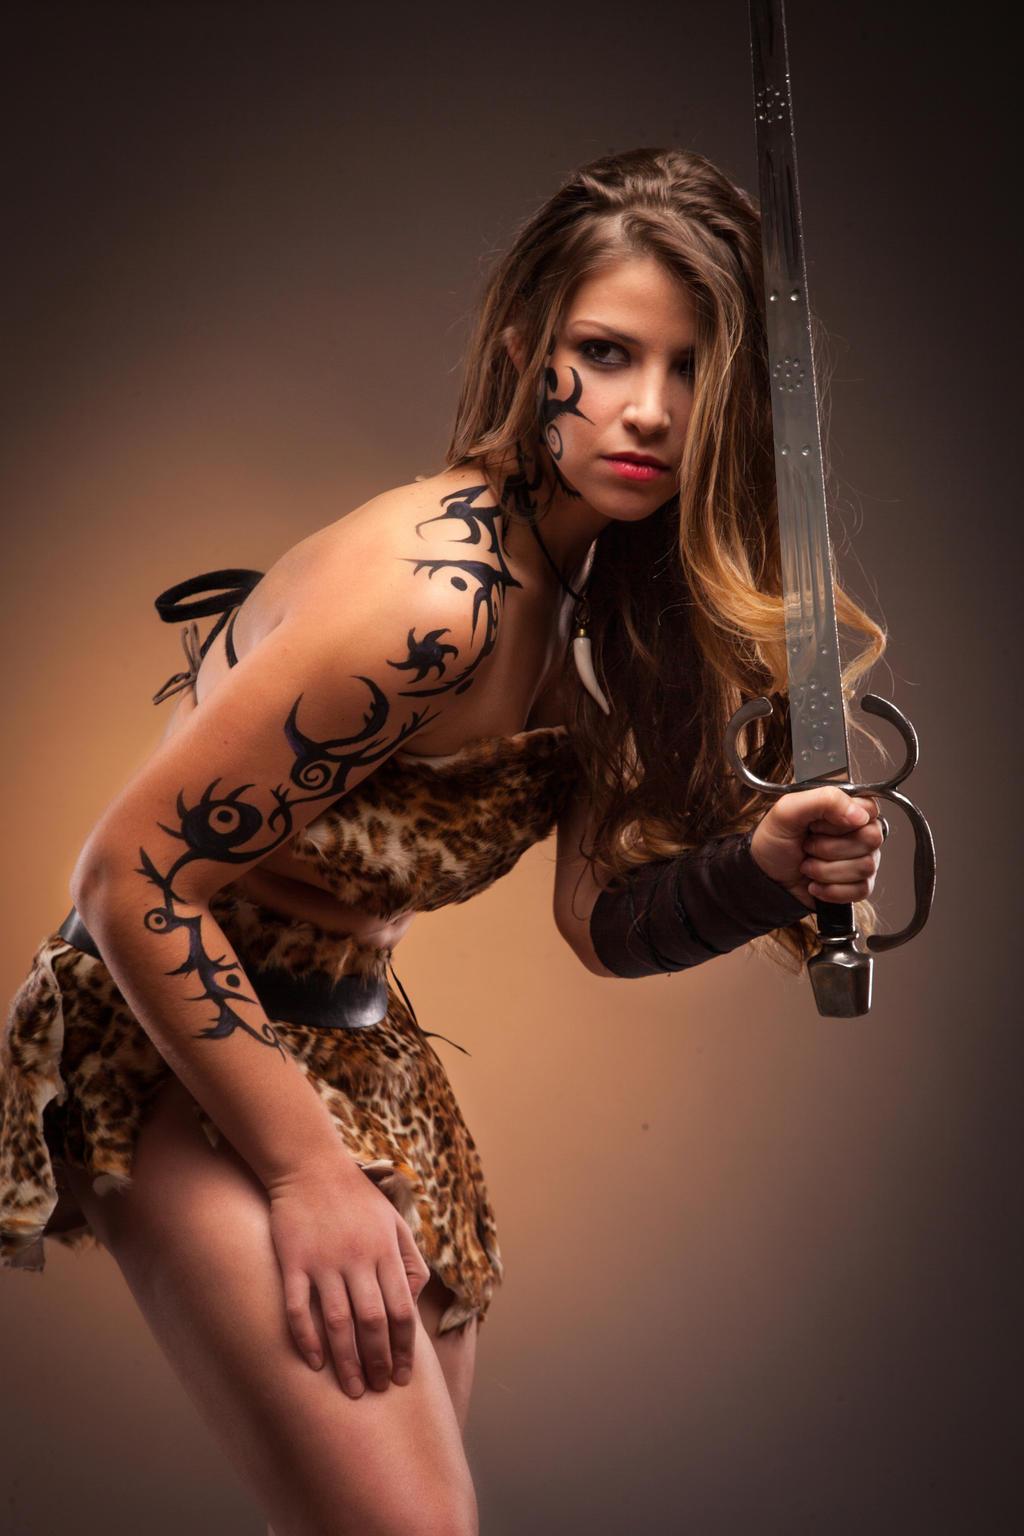 Amazon Womanizer